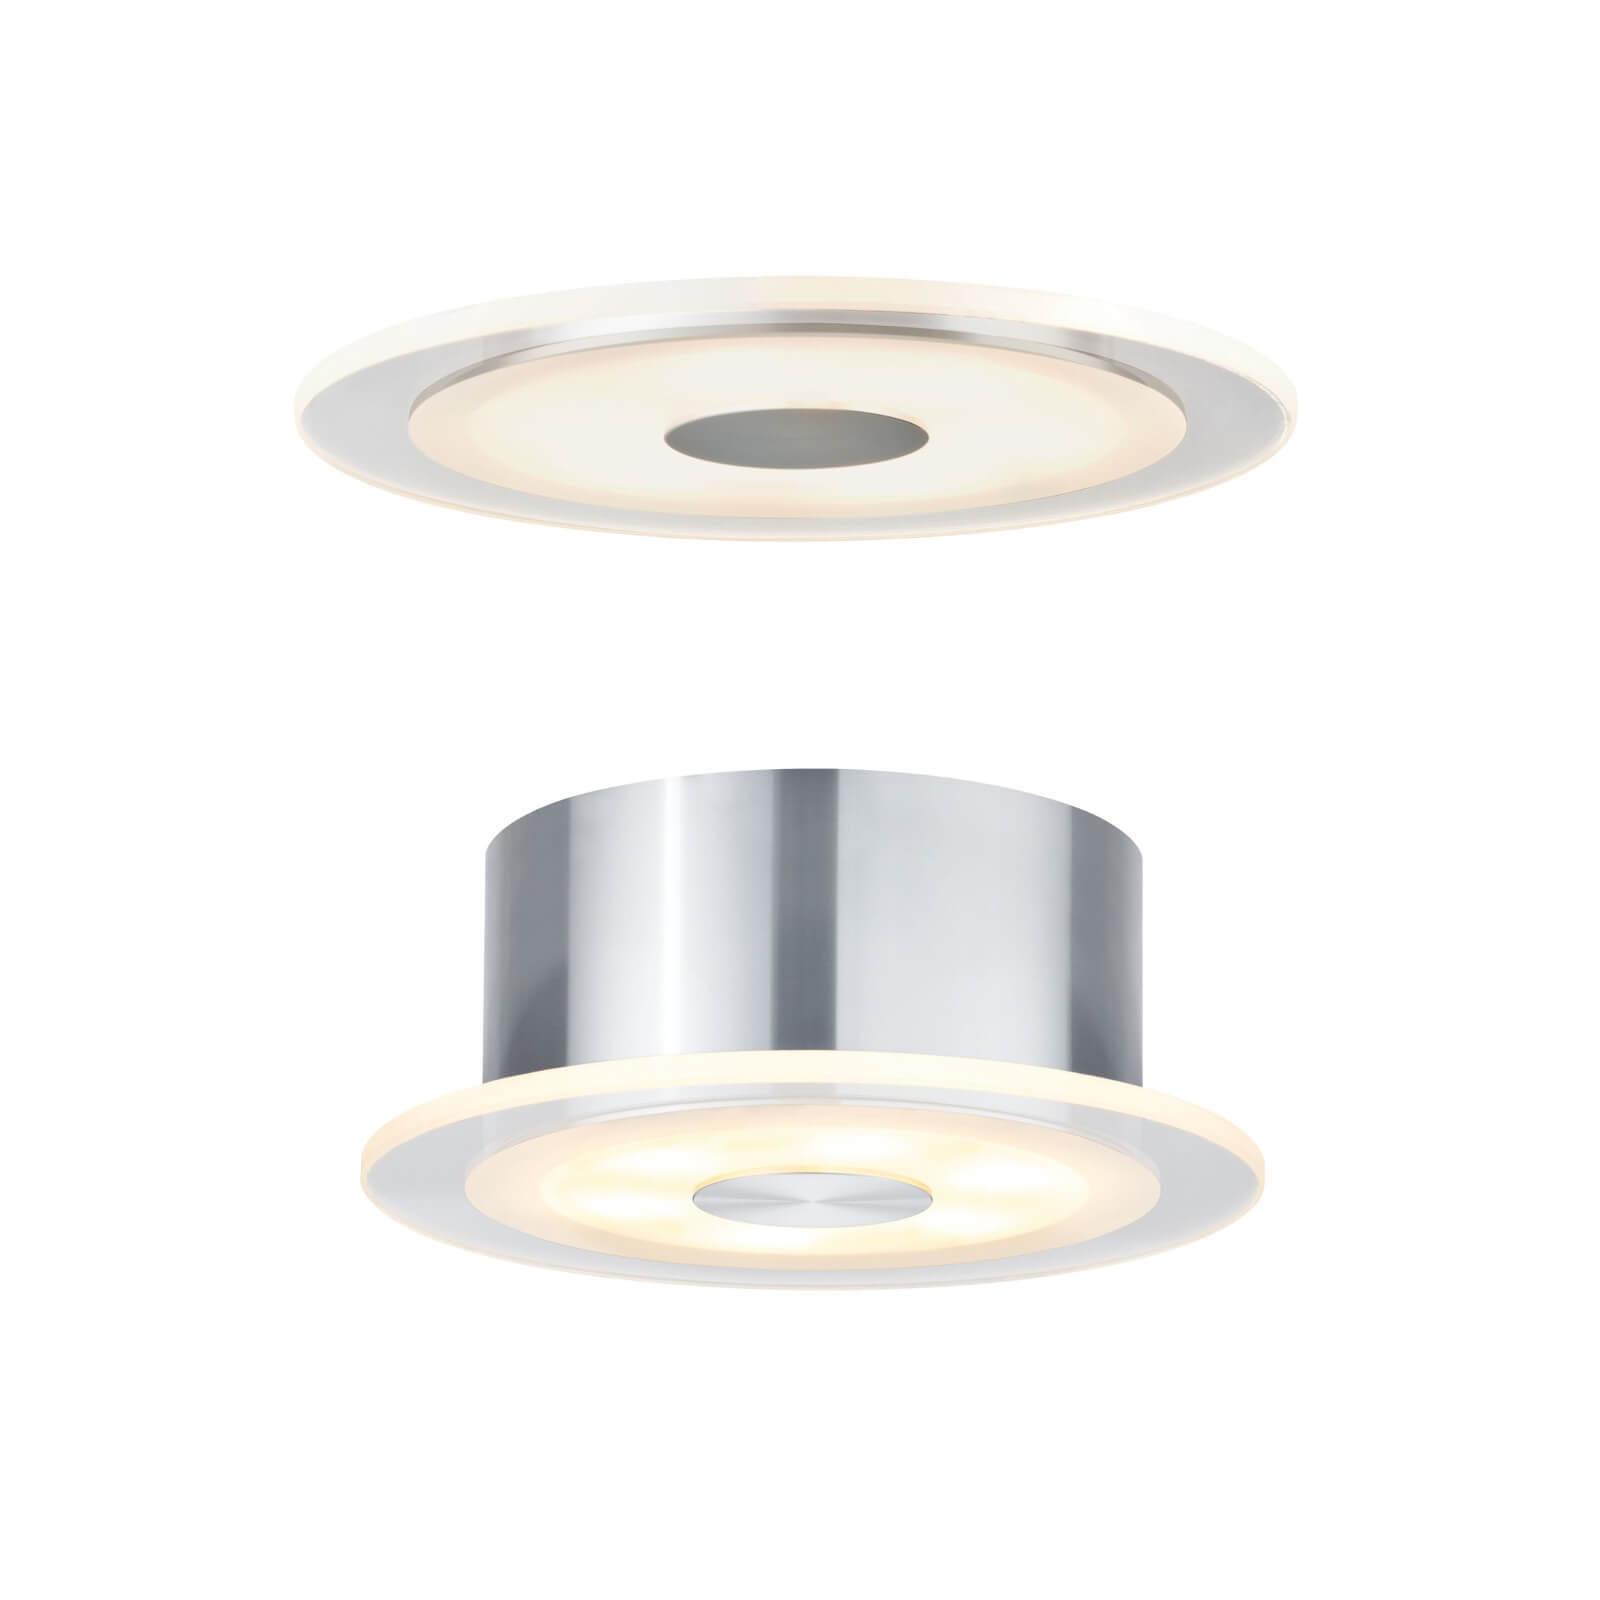 Paulmann Einbau-   Aufbauleuchten-Set Premium Line Whirl LED 6W Alu Satin